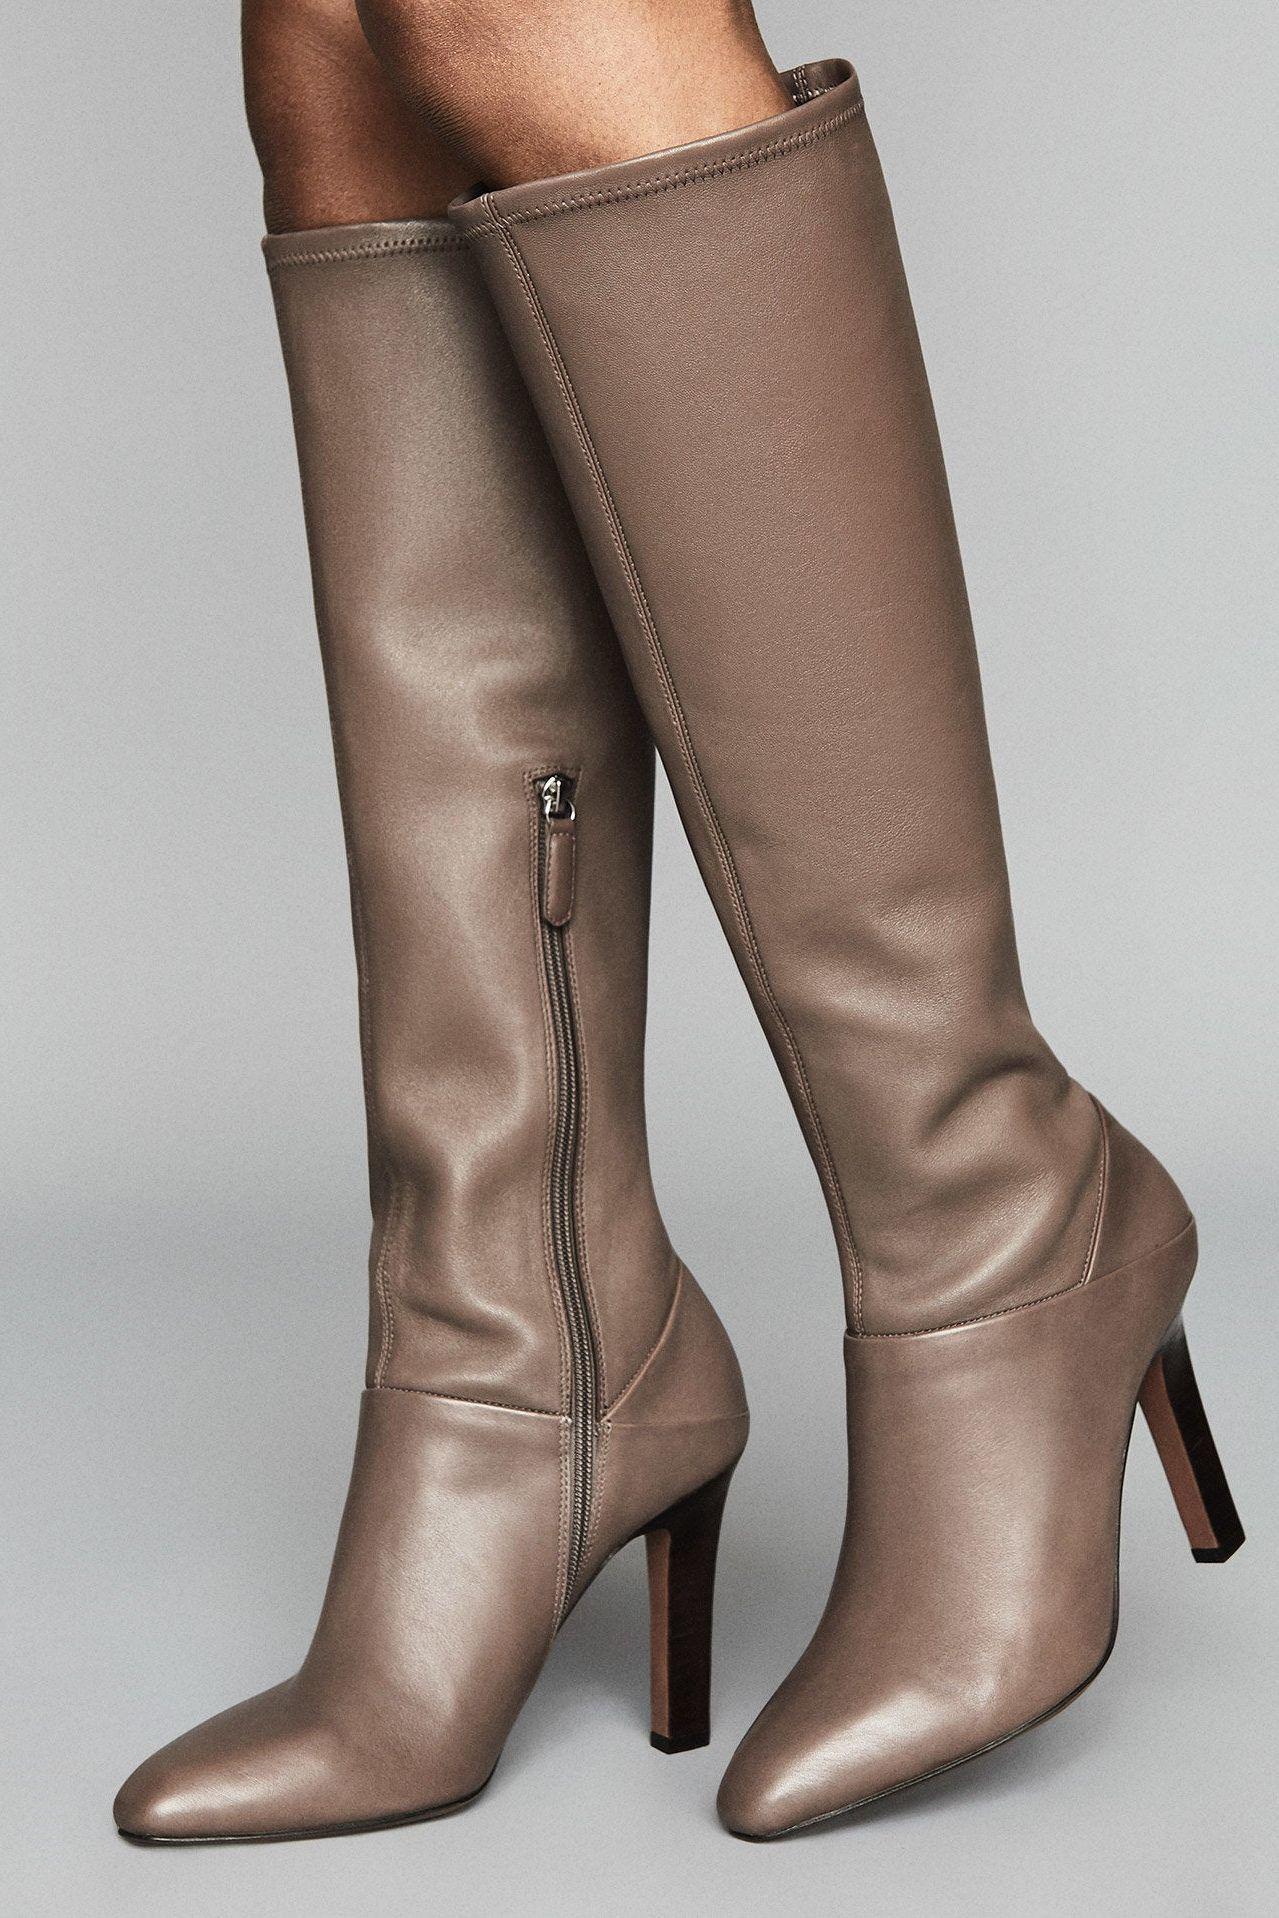 Cresida Caramel Leather Knee High Boots